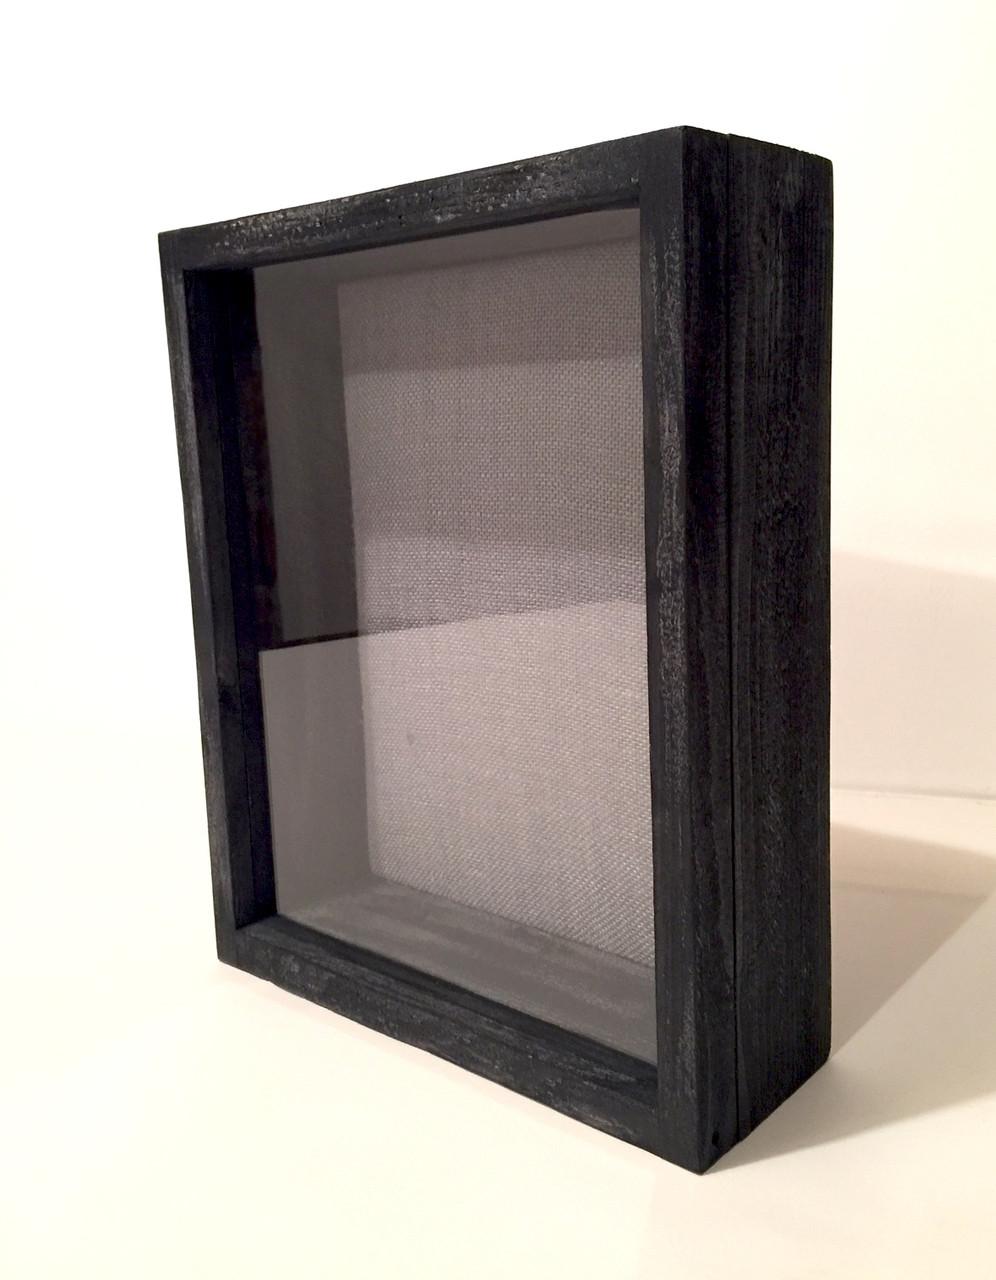 11 x 14 x 4 inch Deep Shadow Box Frame | The Farm Mechanic